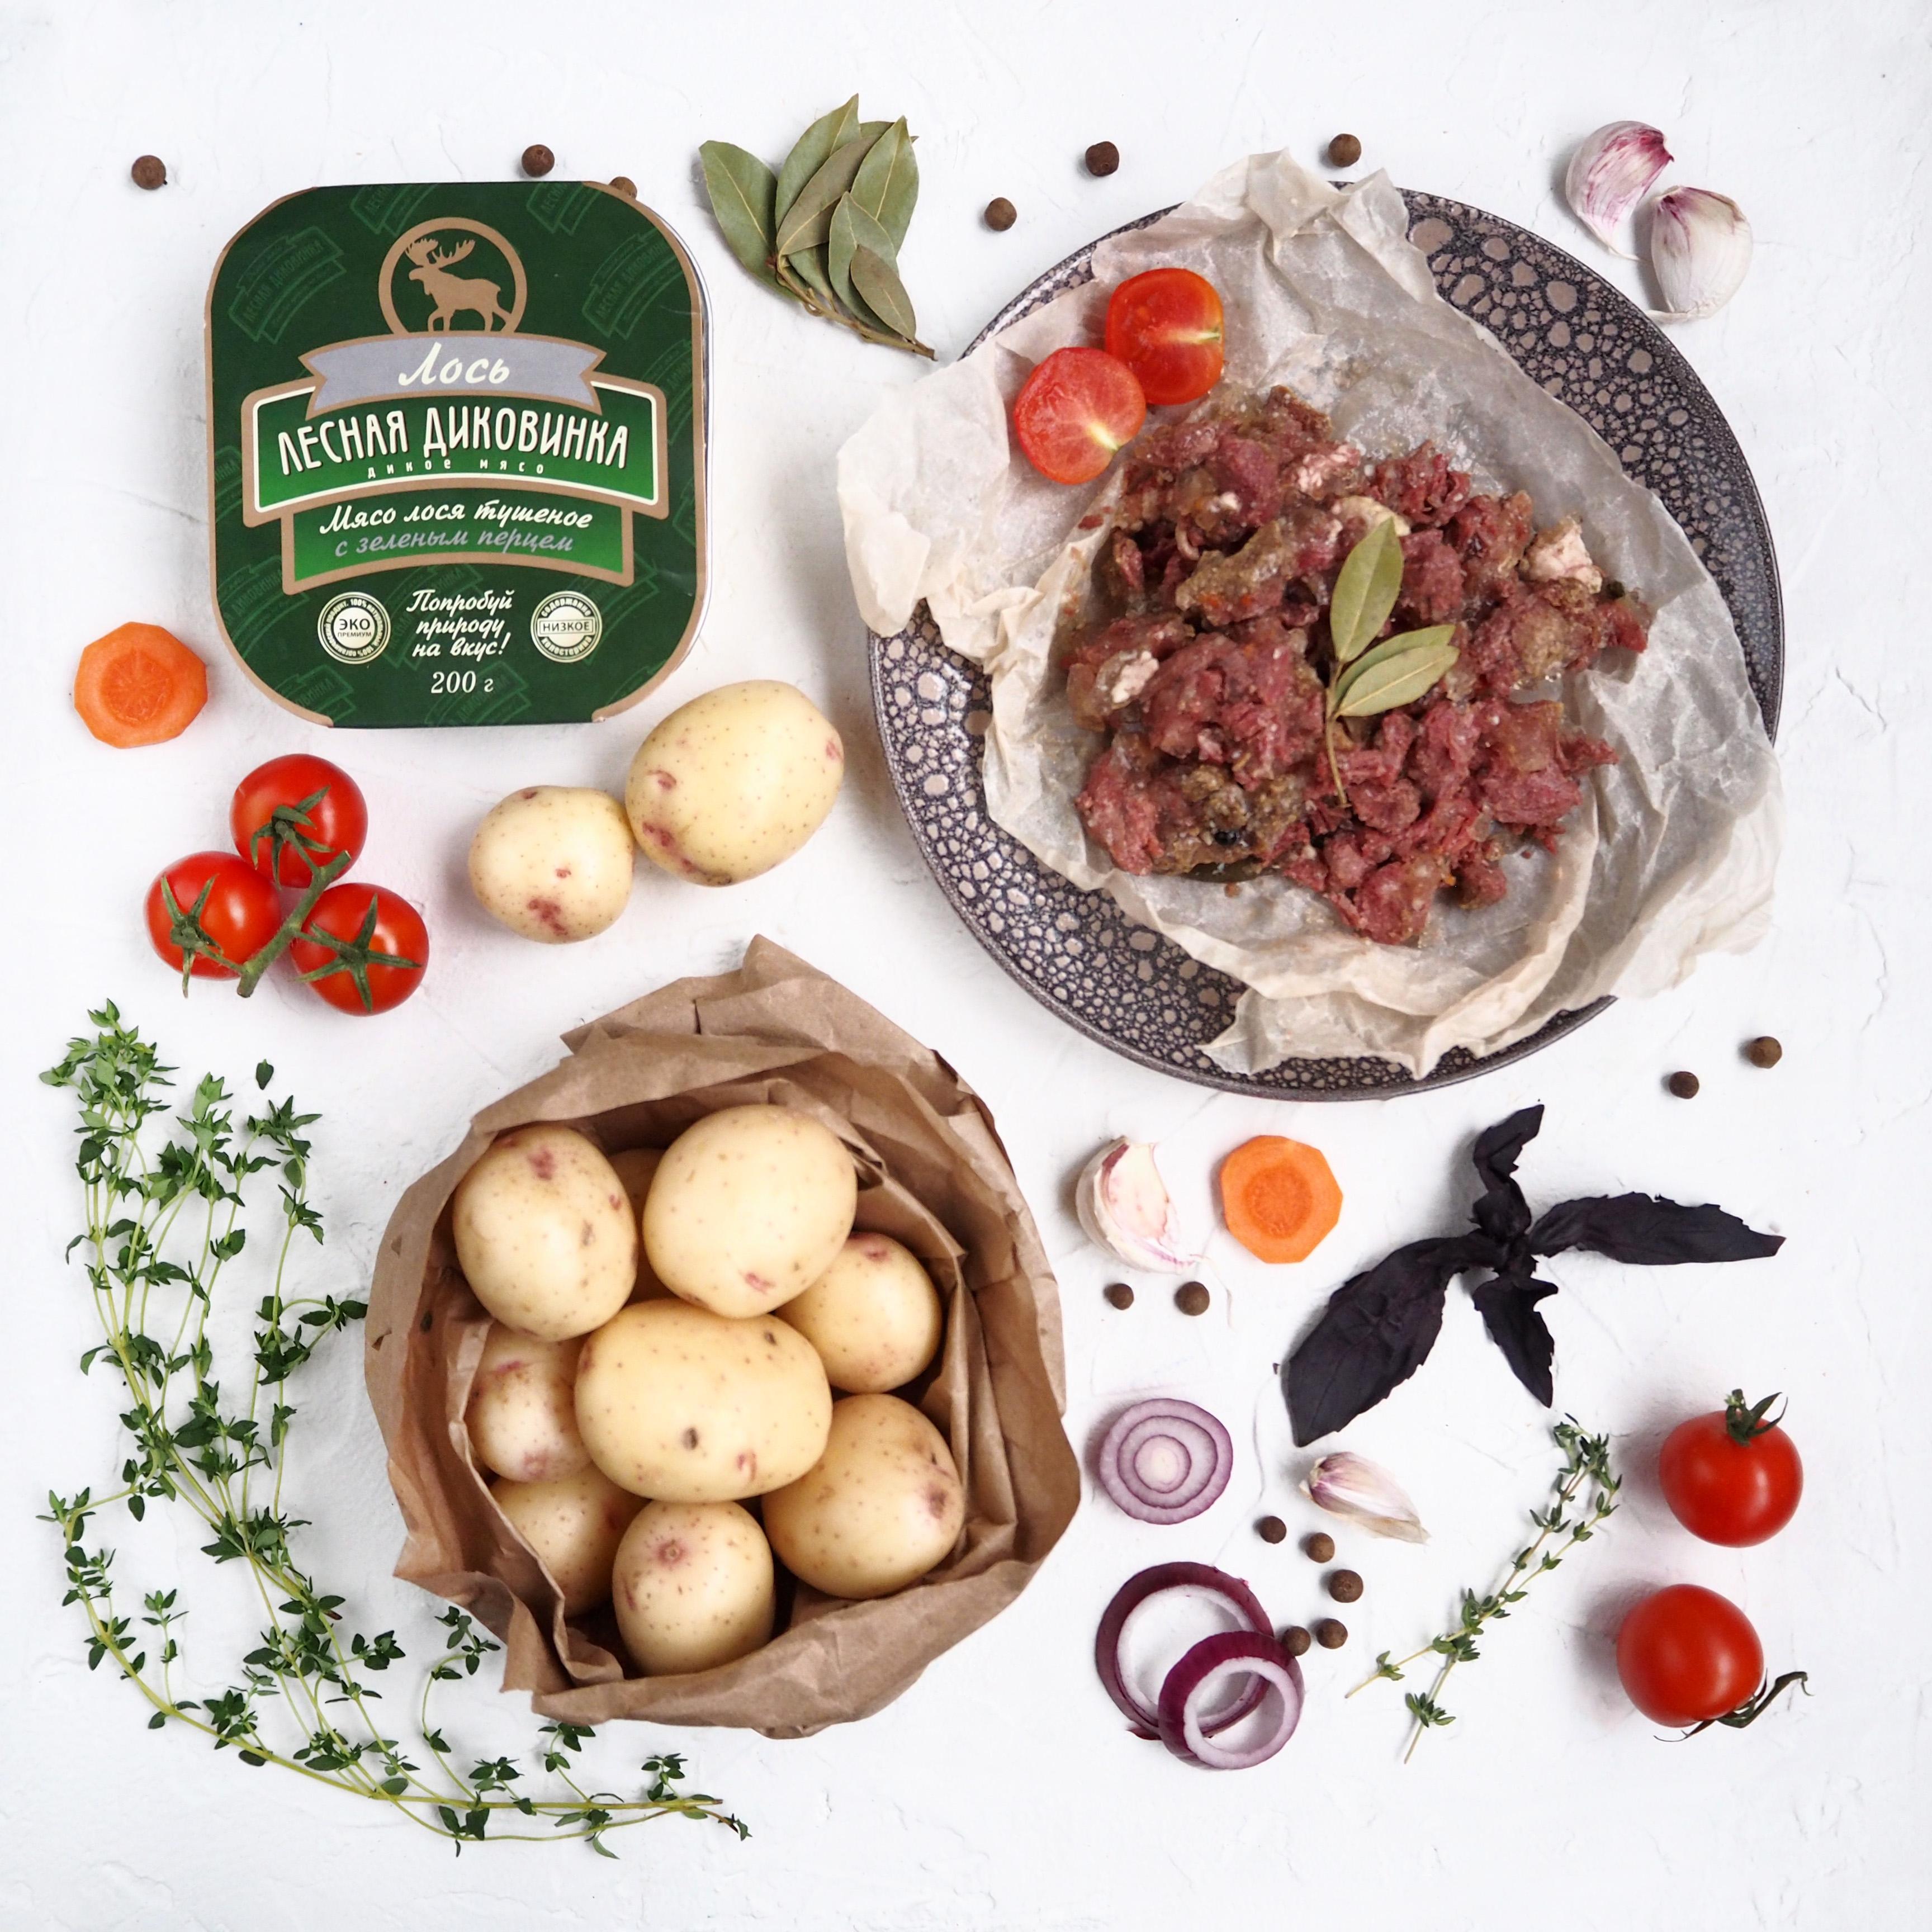 Тушёное мясо лося с зеленым перцем (1 шт., 200 г)